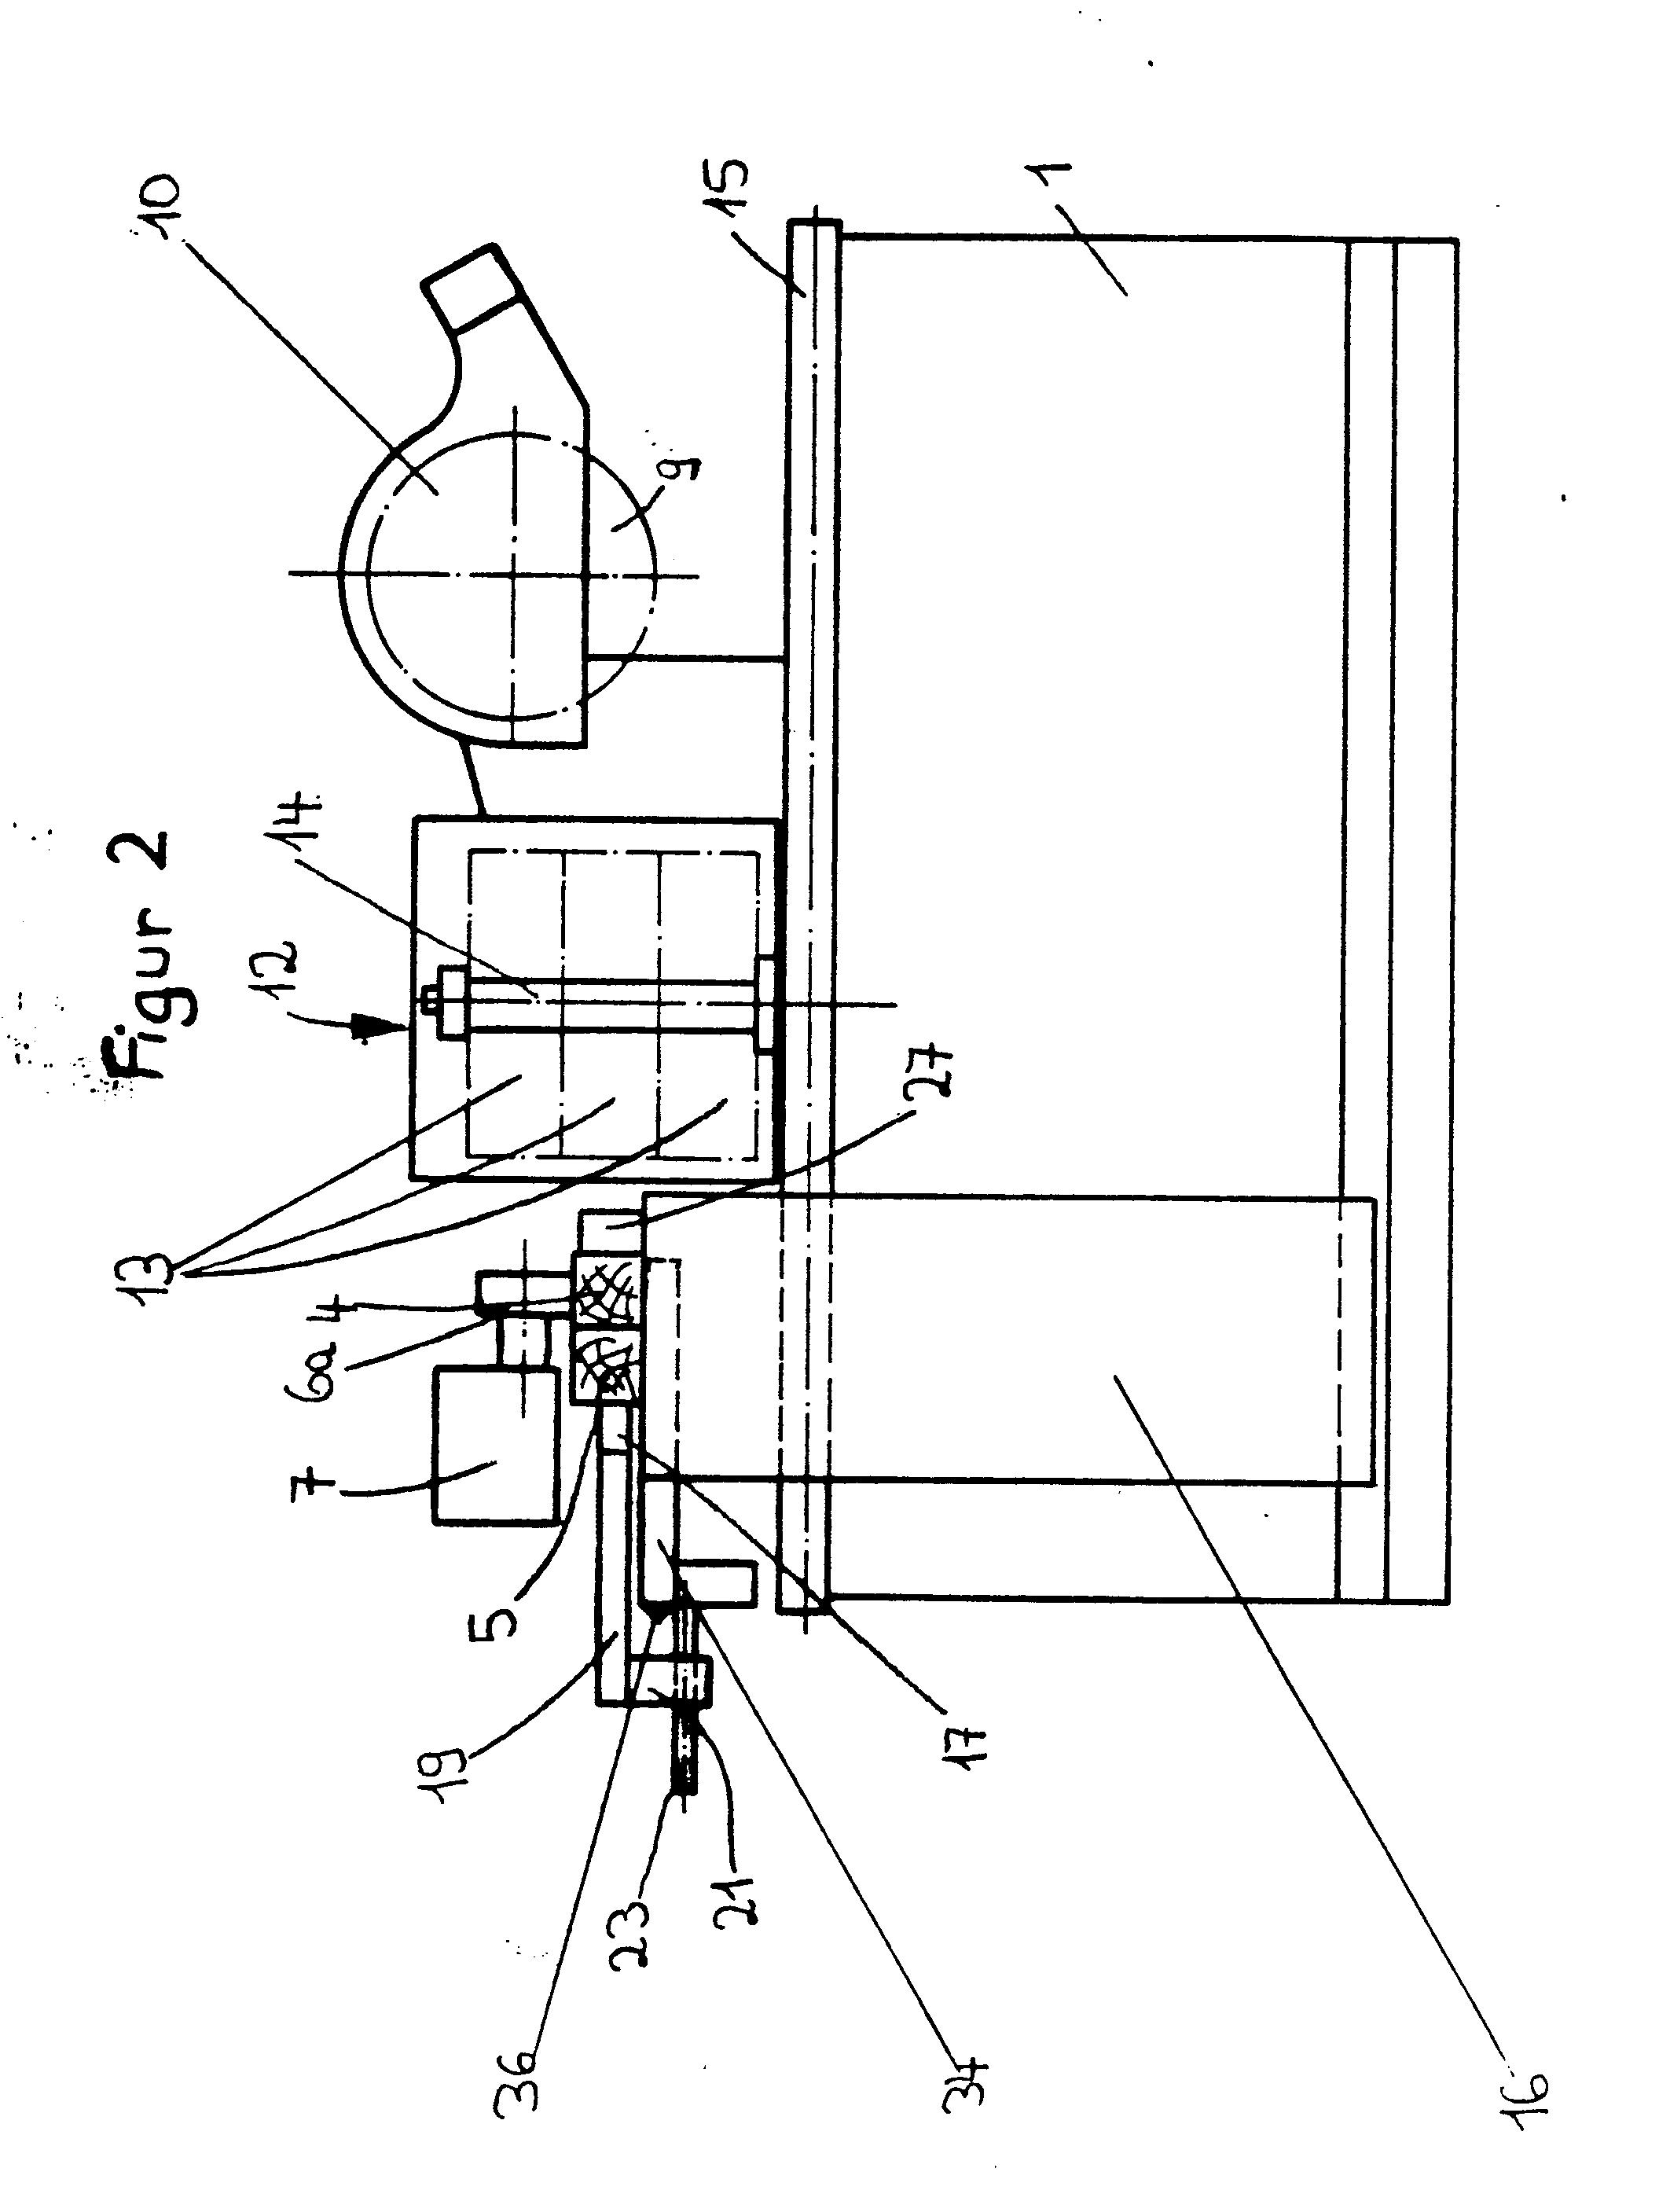 专利ep0221289a2 - maschine